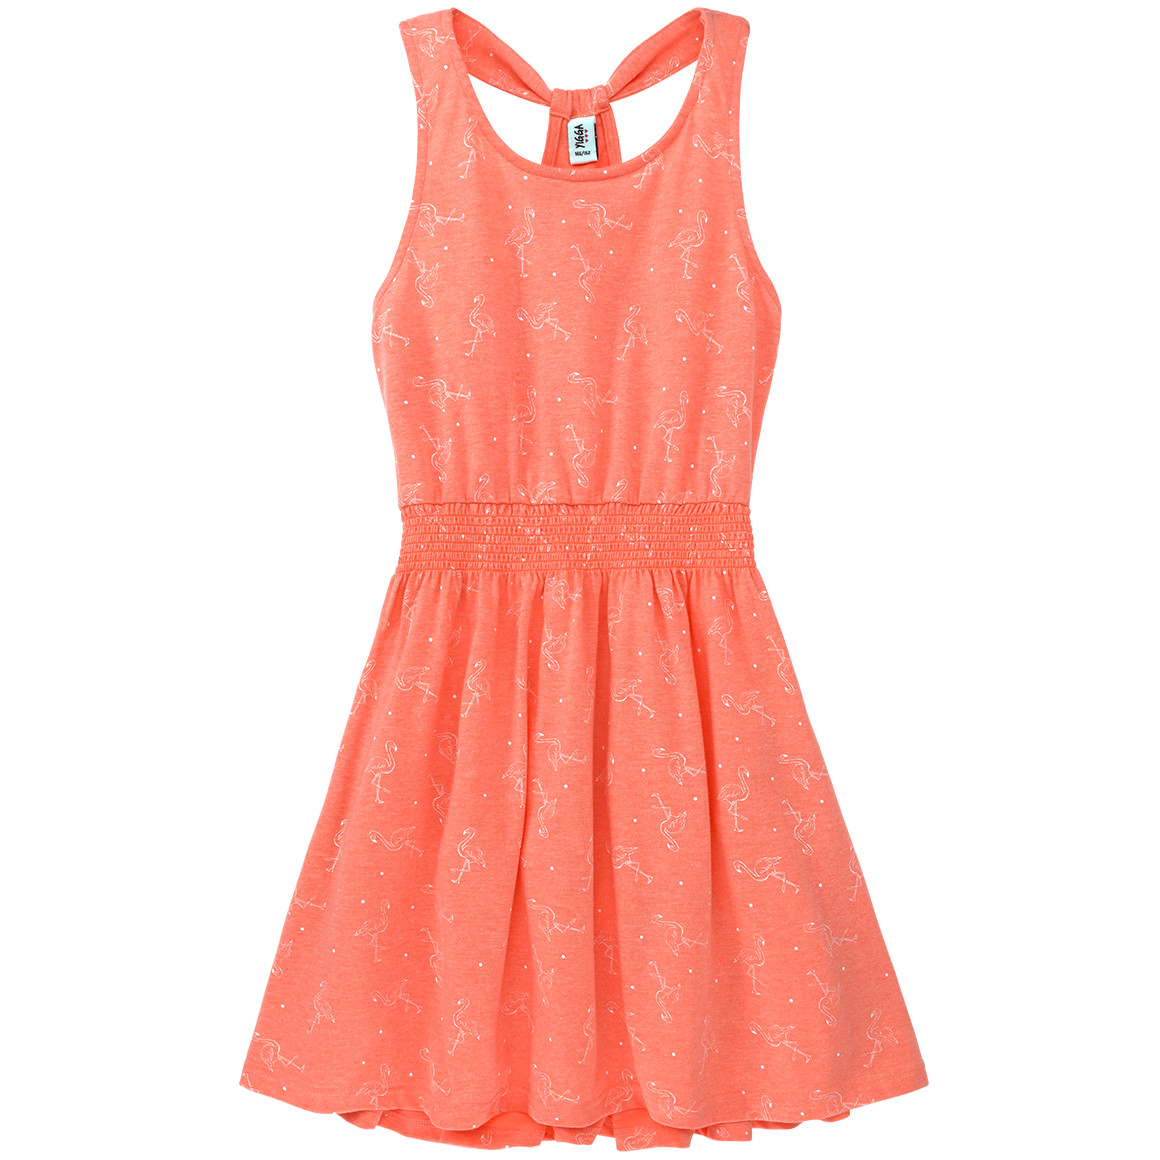 Mädchen Kleid Mit Flamingoallover  Ernsting'S Family